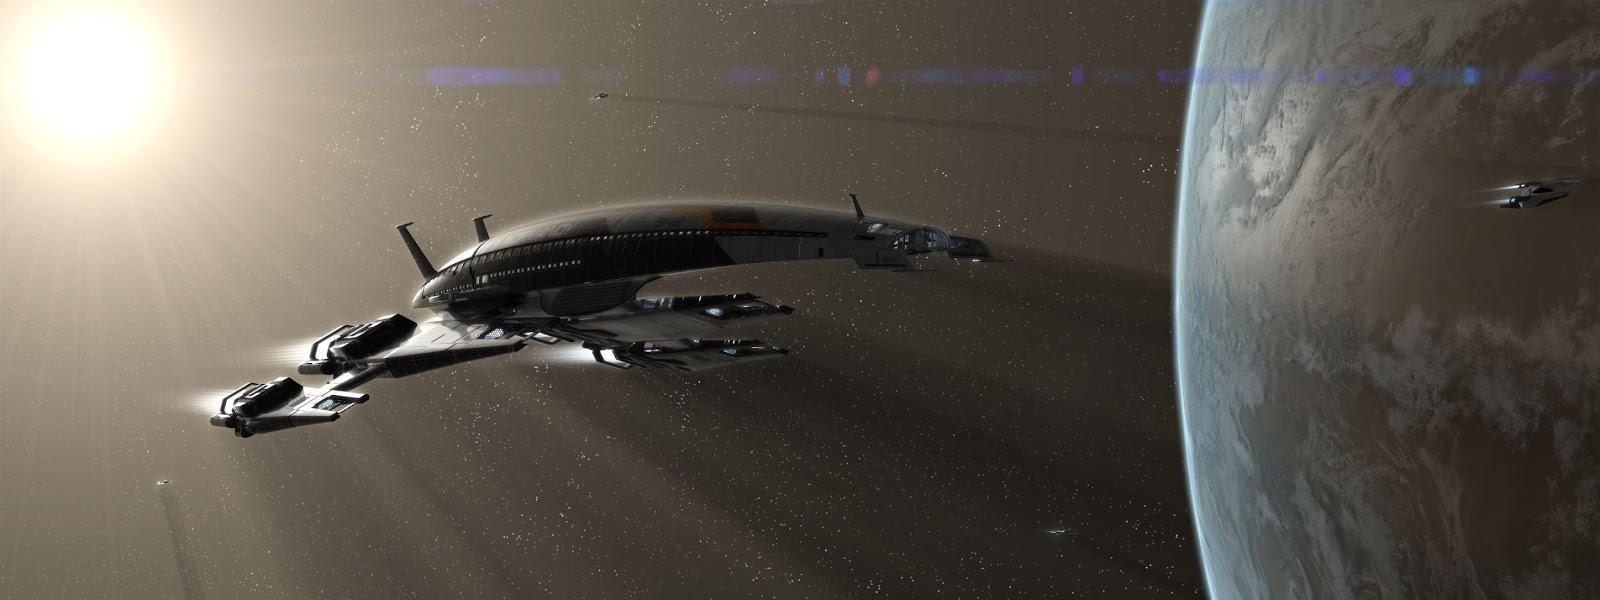 Ssv Normandy Sr 2 18 Ship Replica: Welcome To Dark Corner CGI: SSV Normandy SR2